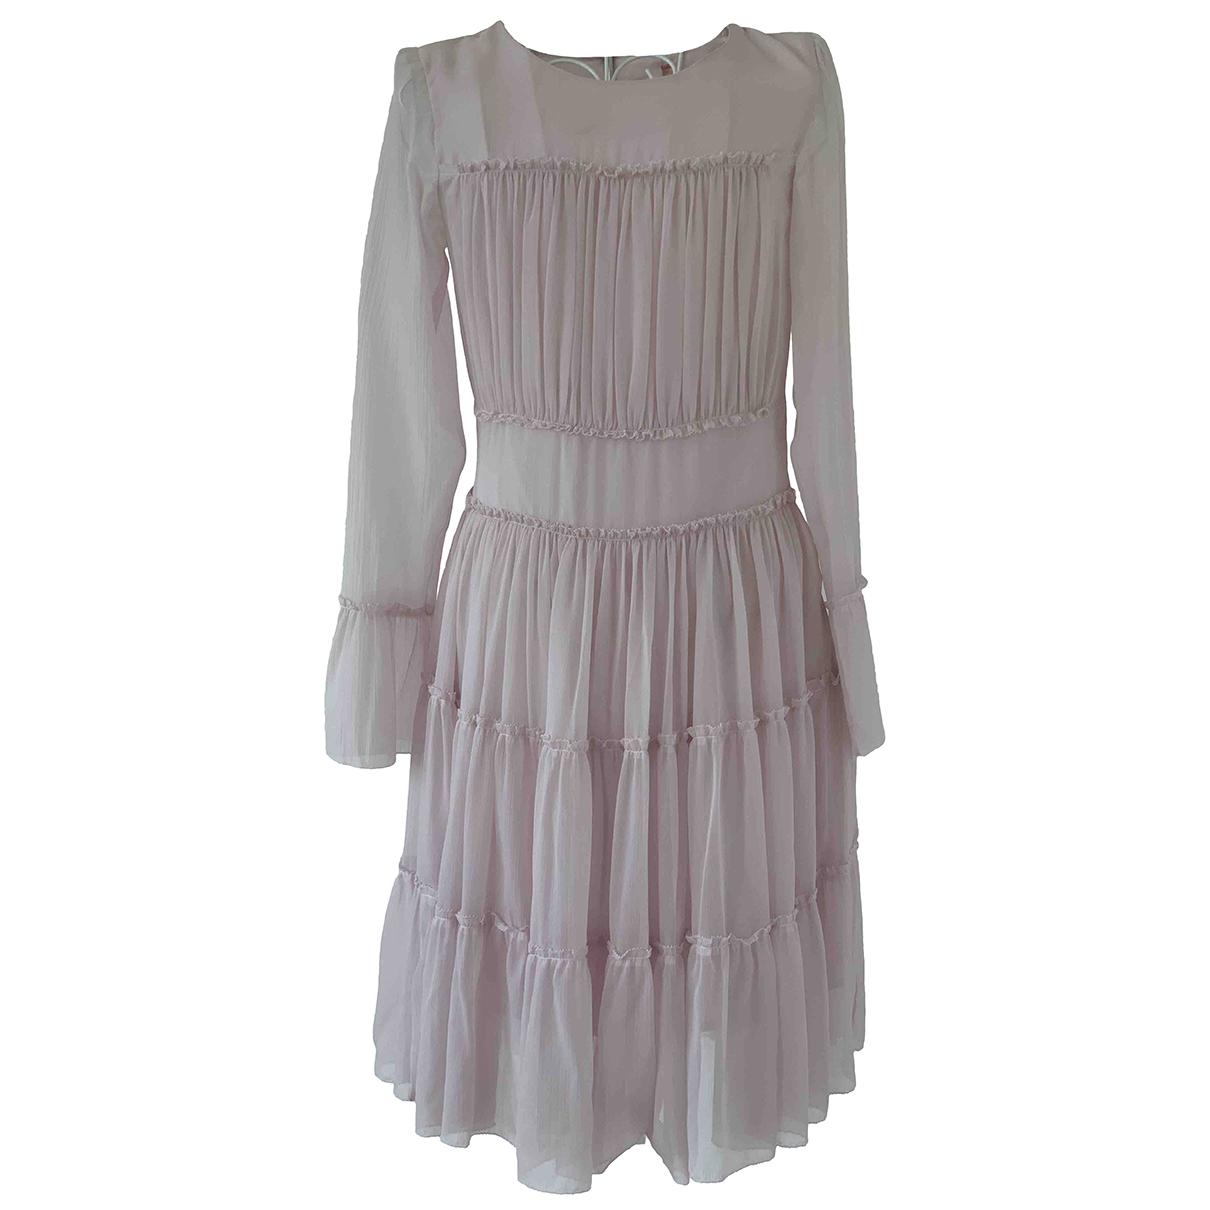 Marc Cain \N Pink dress for Women S International